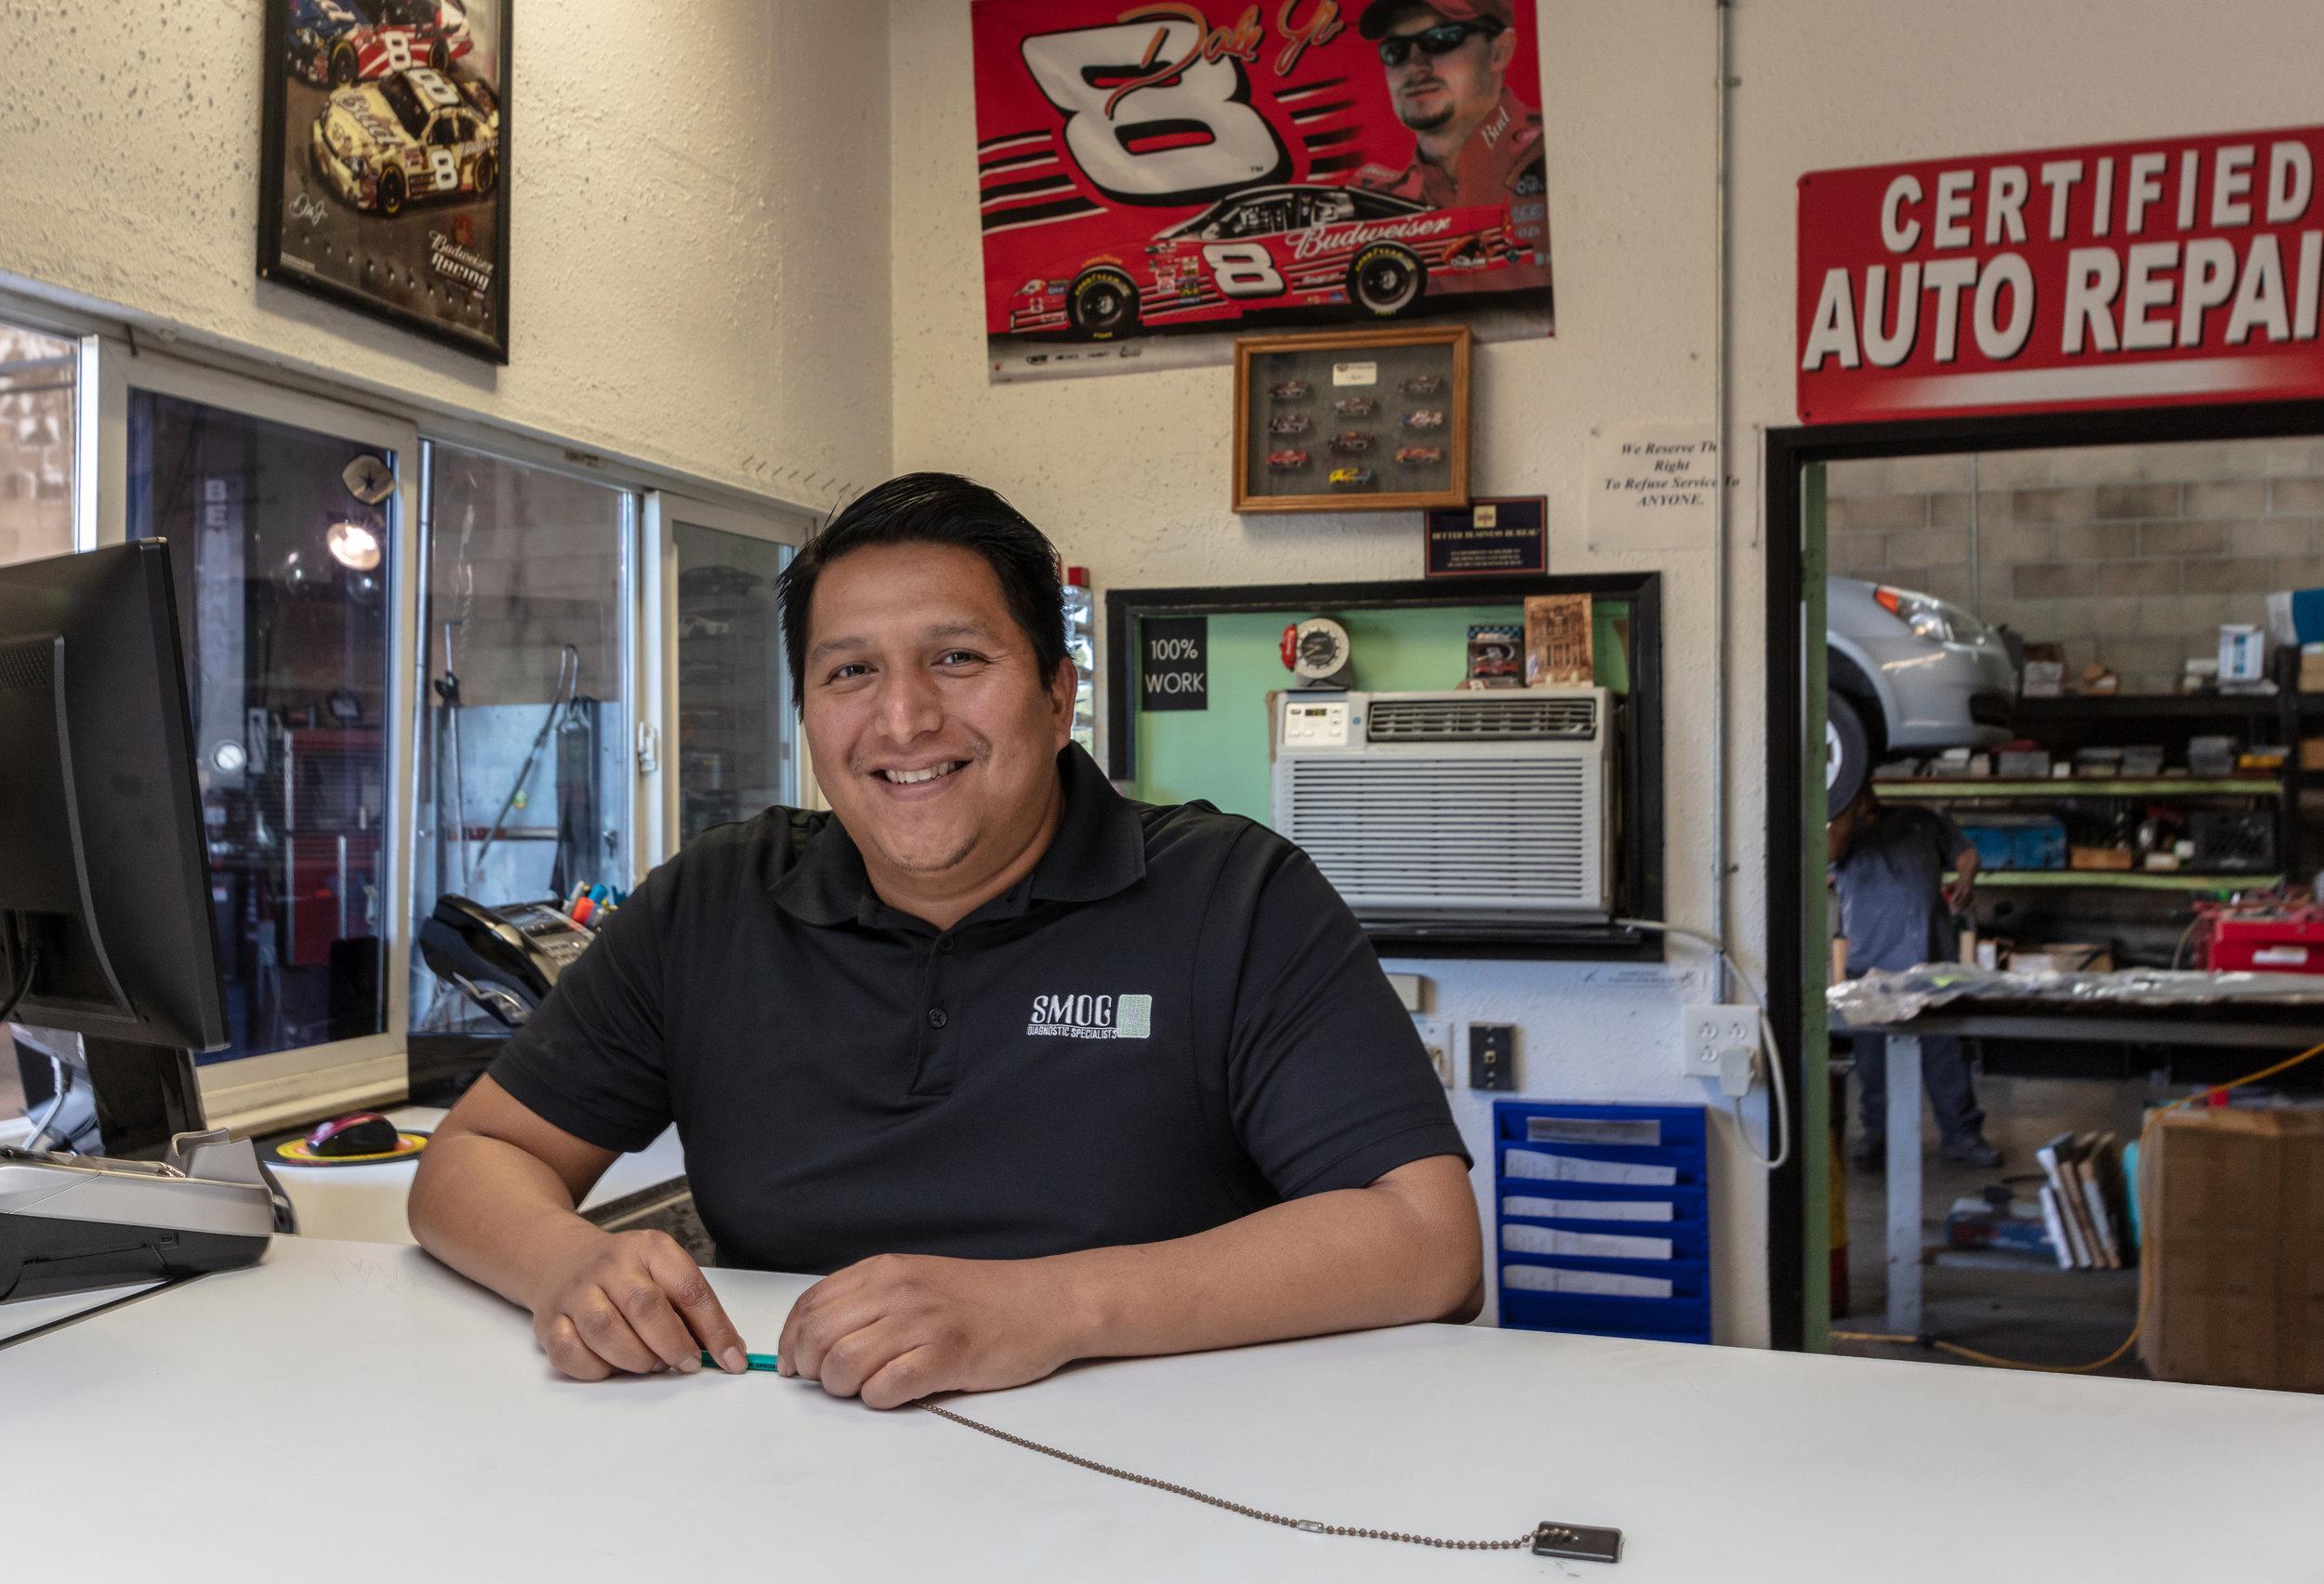 SMOG-Diagnostic-Specialists-Auto-Repair-And-Maintenance-Northgate-Blvd-Sacramento-CA-Book-Appointment.jpg